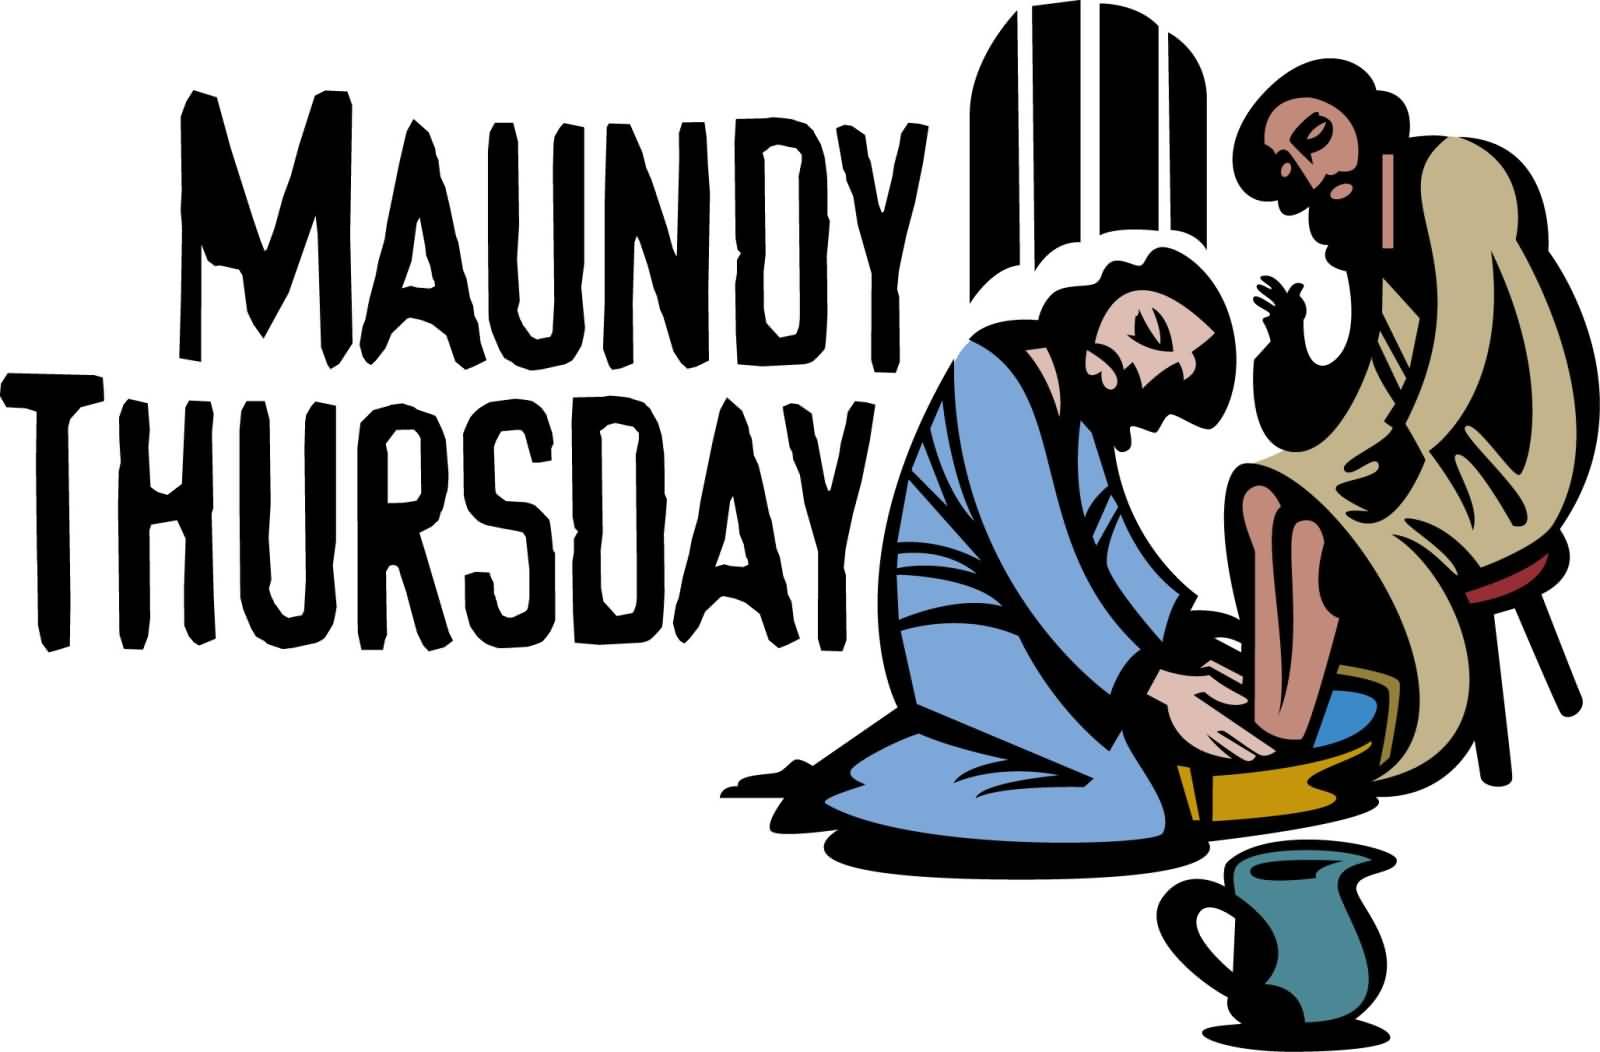 Maundy Thursday Clipart-Maundy Thursday Clipart-11